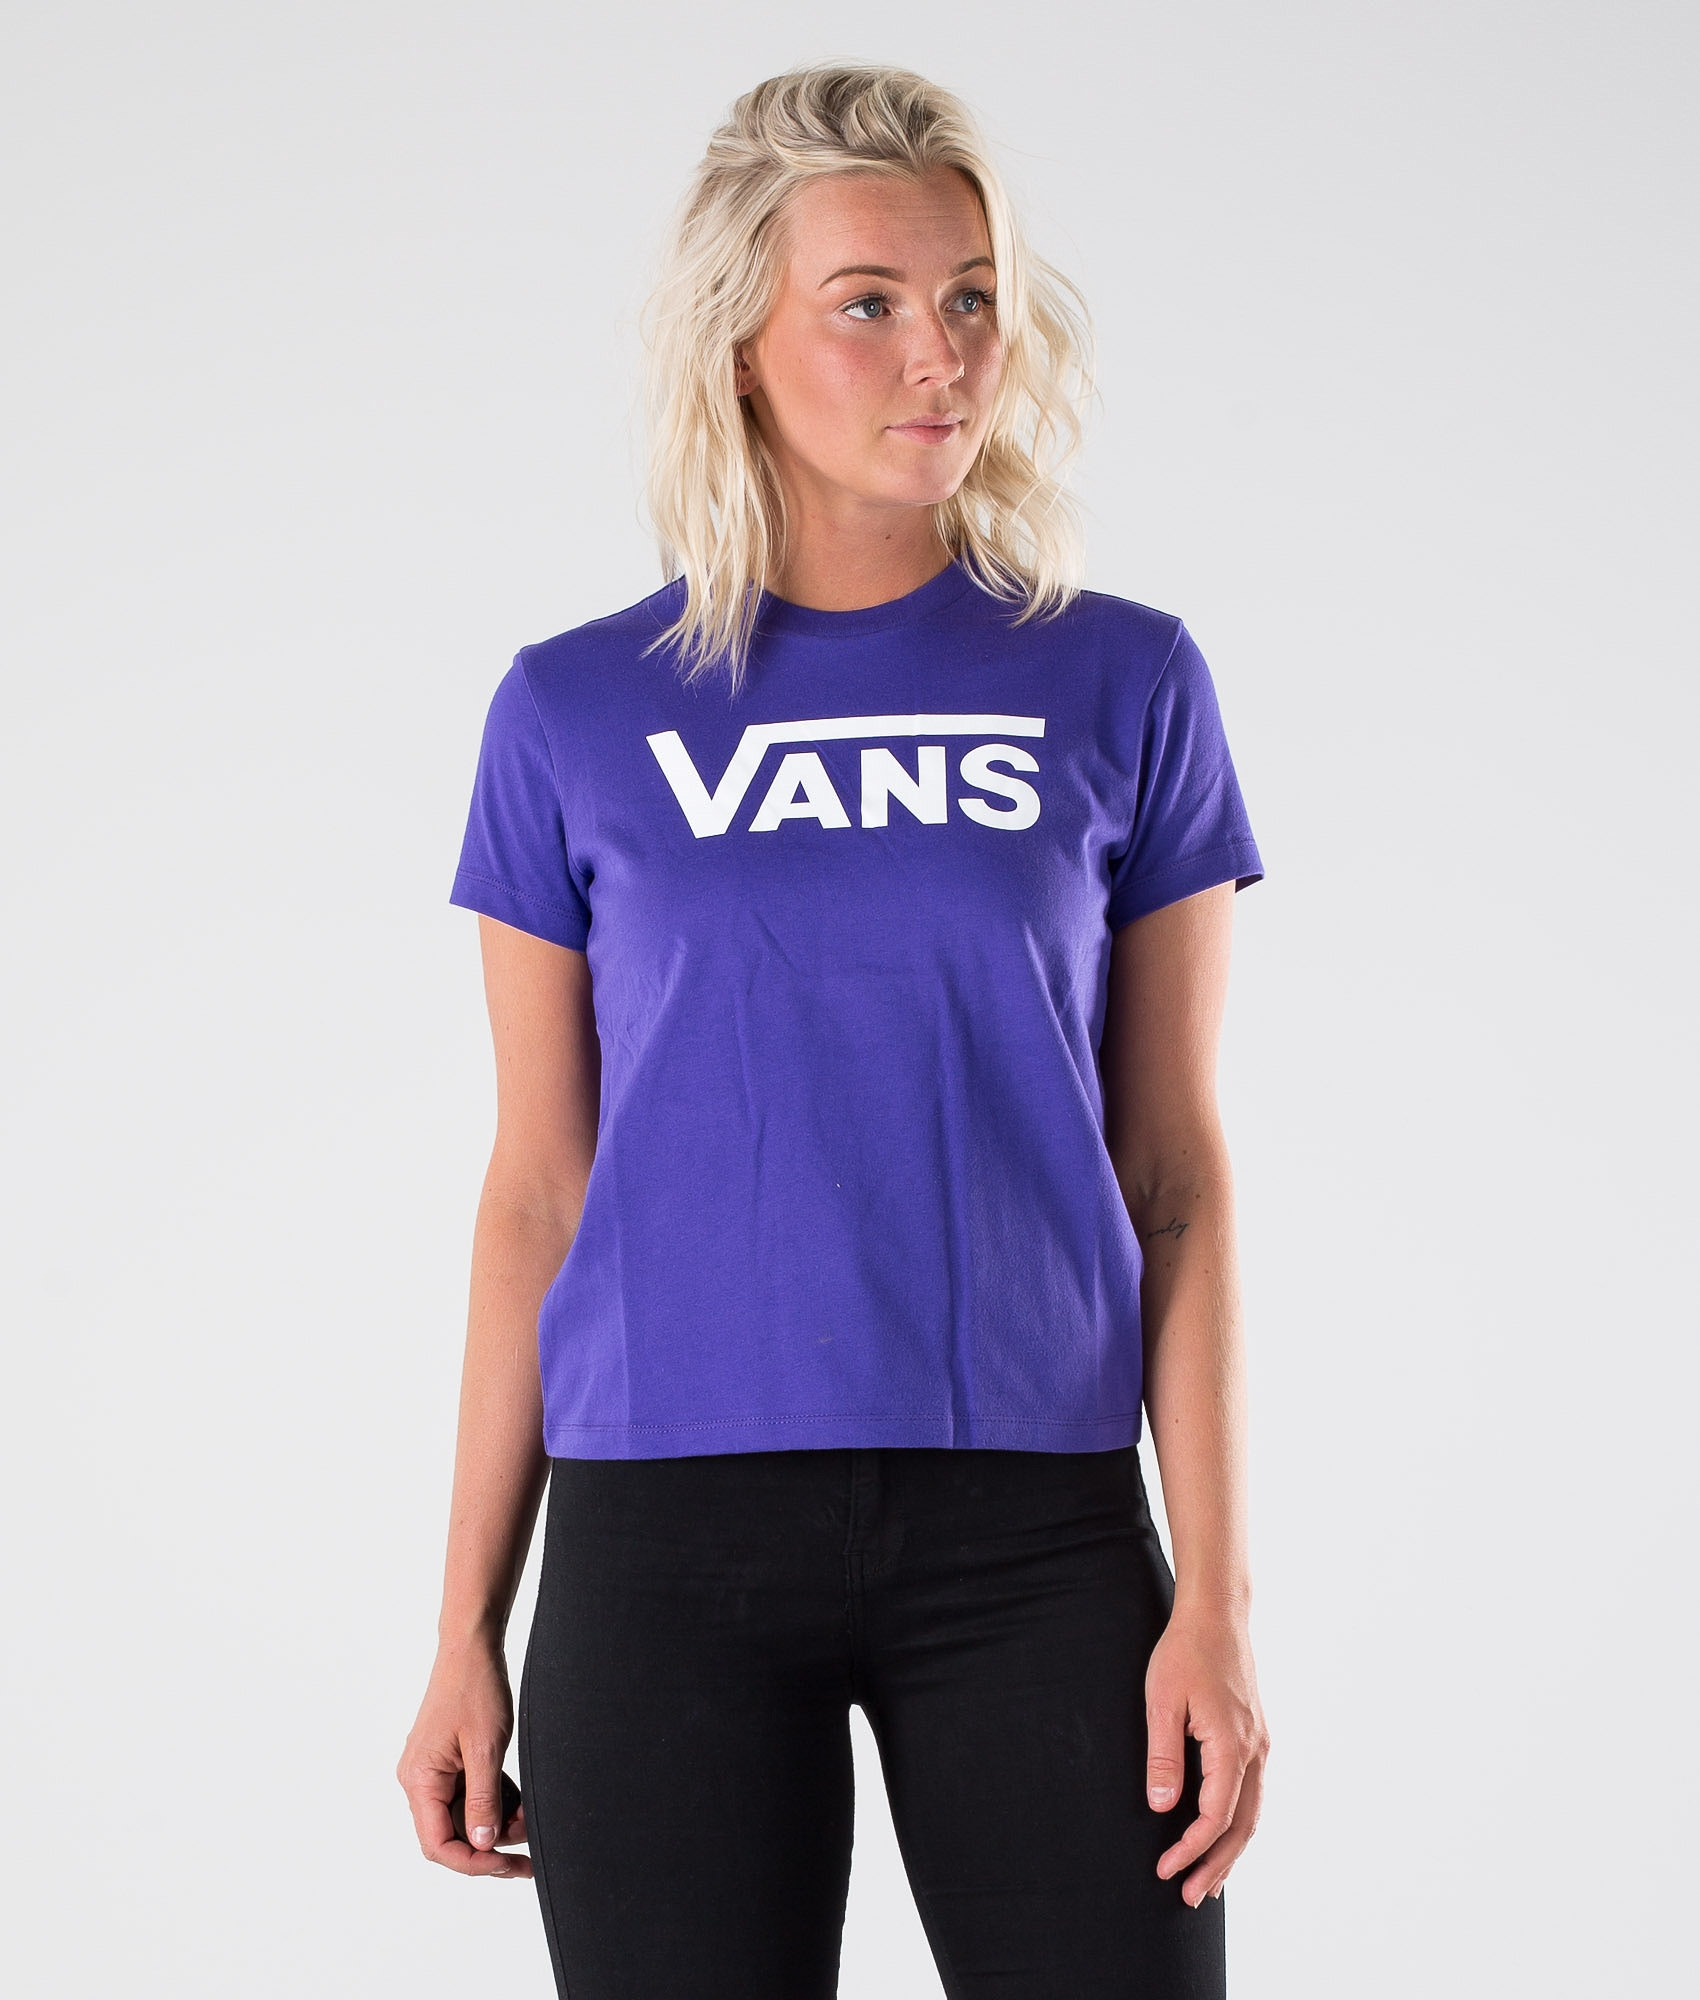 56b2f951fc1ce Vans Flying V Crew T-shirt Evening Haze - Ridestore.com